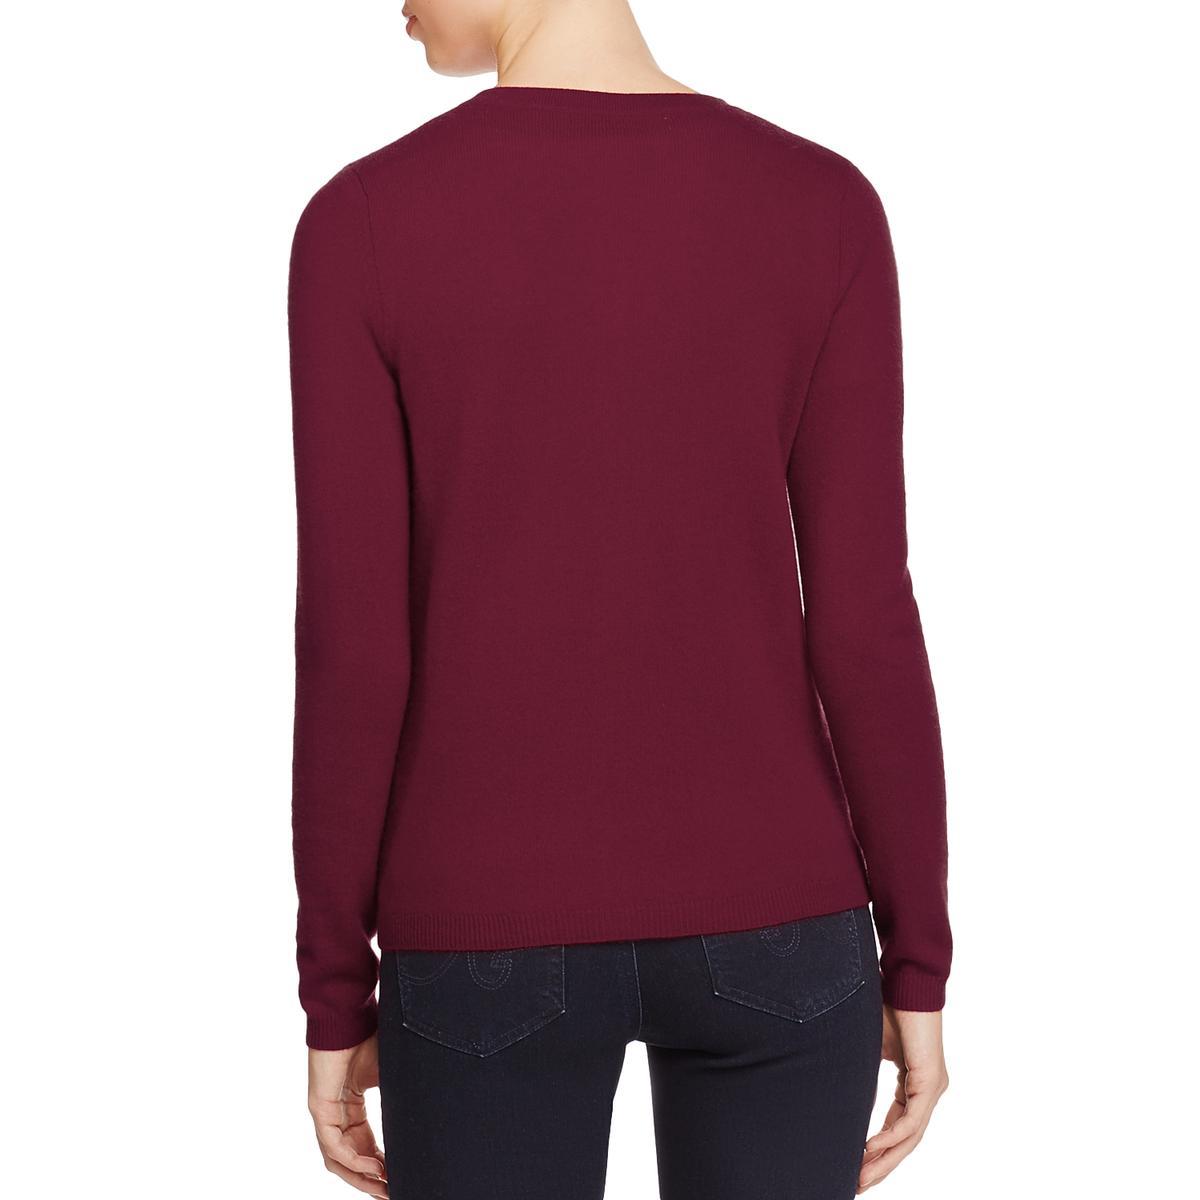 Private Label Womens Cashmere Crew Neck Layering Cardigan Sweater ... 2dbf6a559